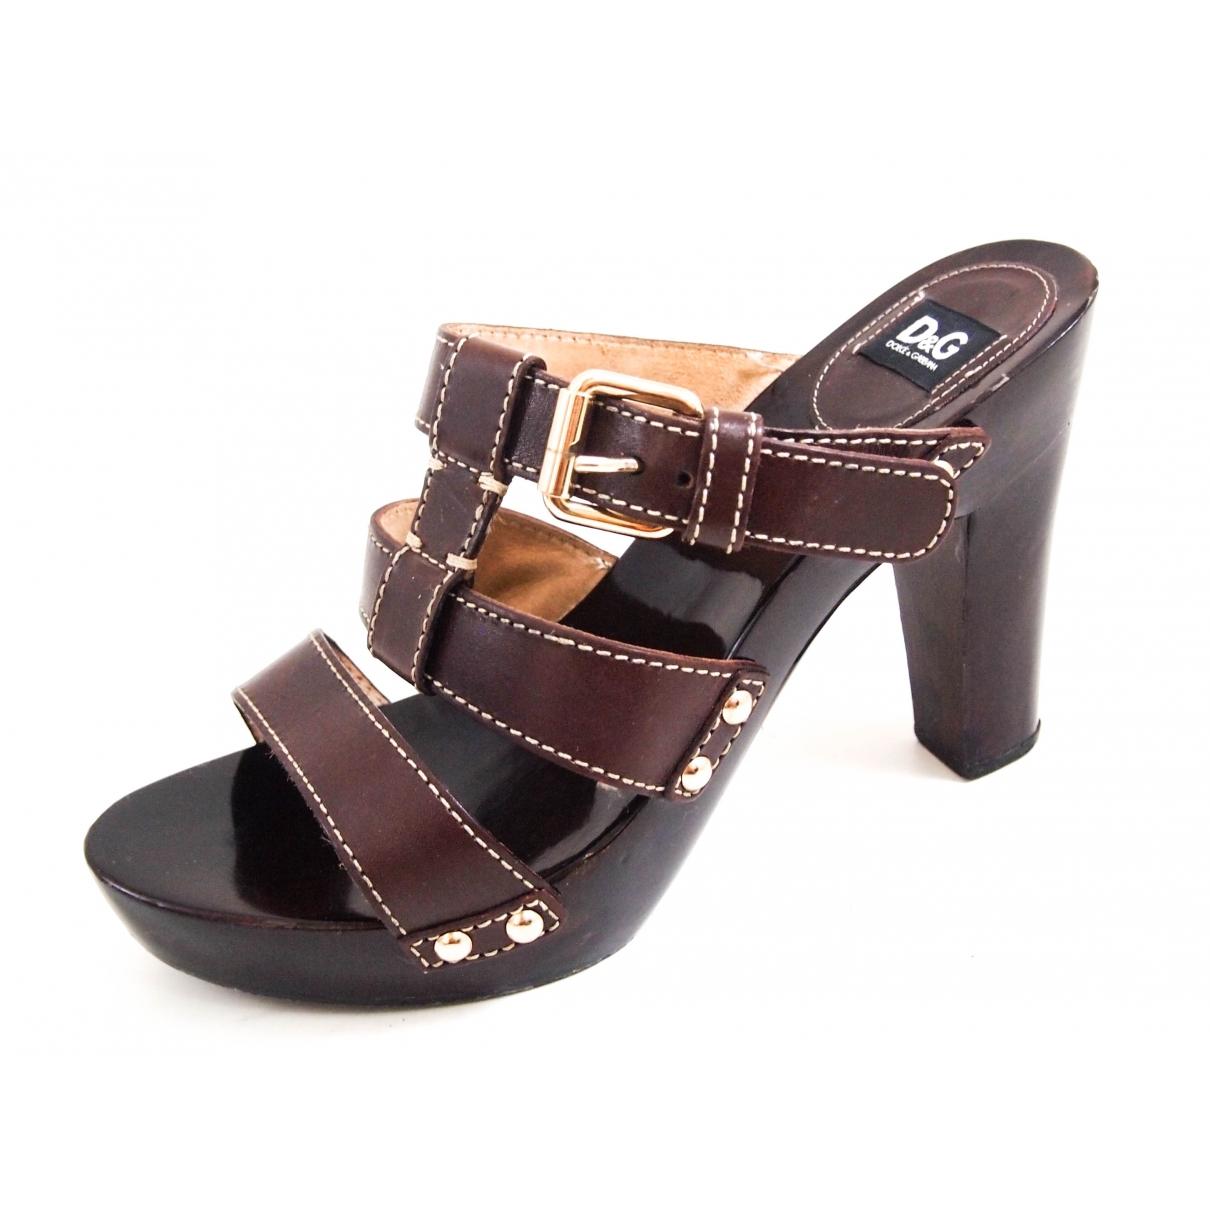 Dolce & Gabbana \N Brown Leather Sandals for Women 38.5 EU